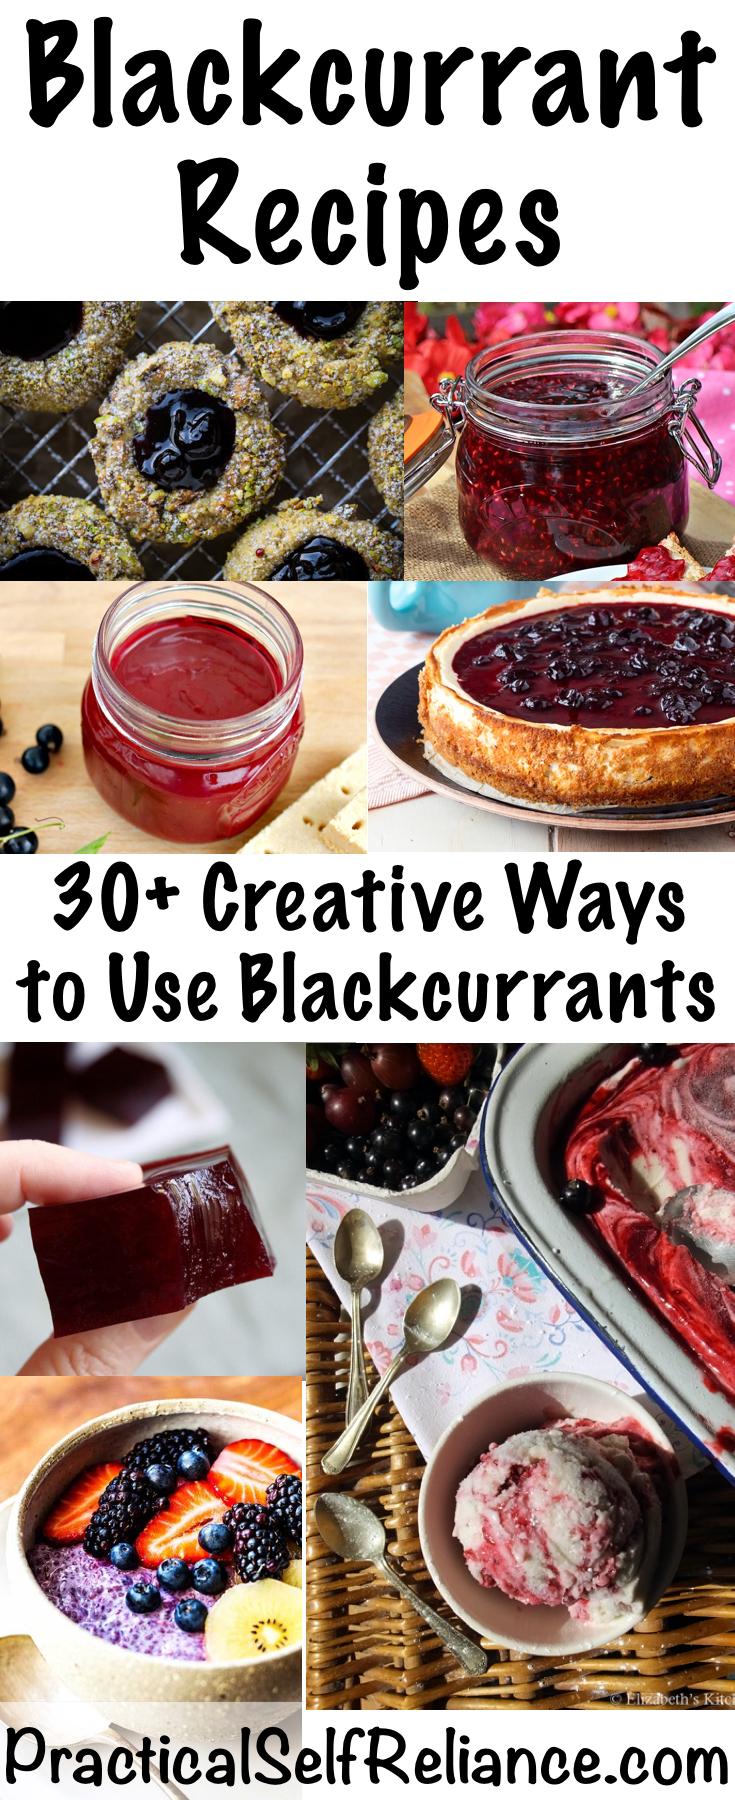 Blackcurrant Recipes ~ 30+ Creative Ways to Use Blackcurrants